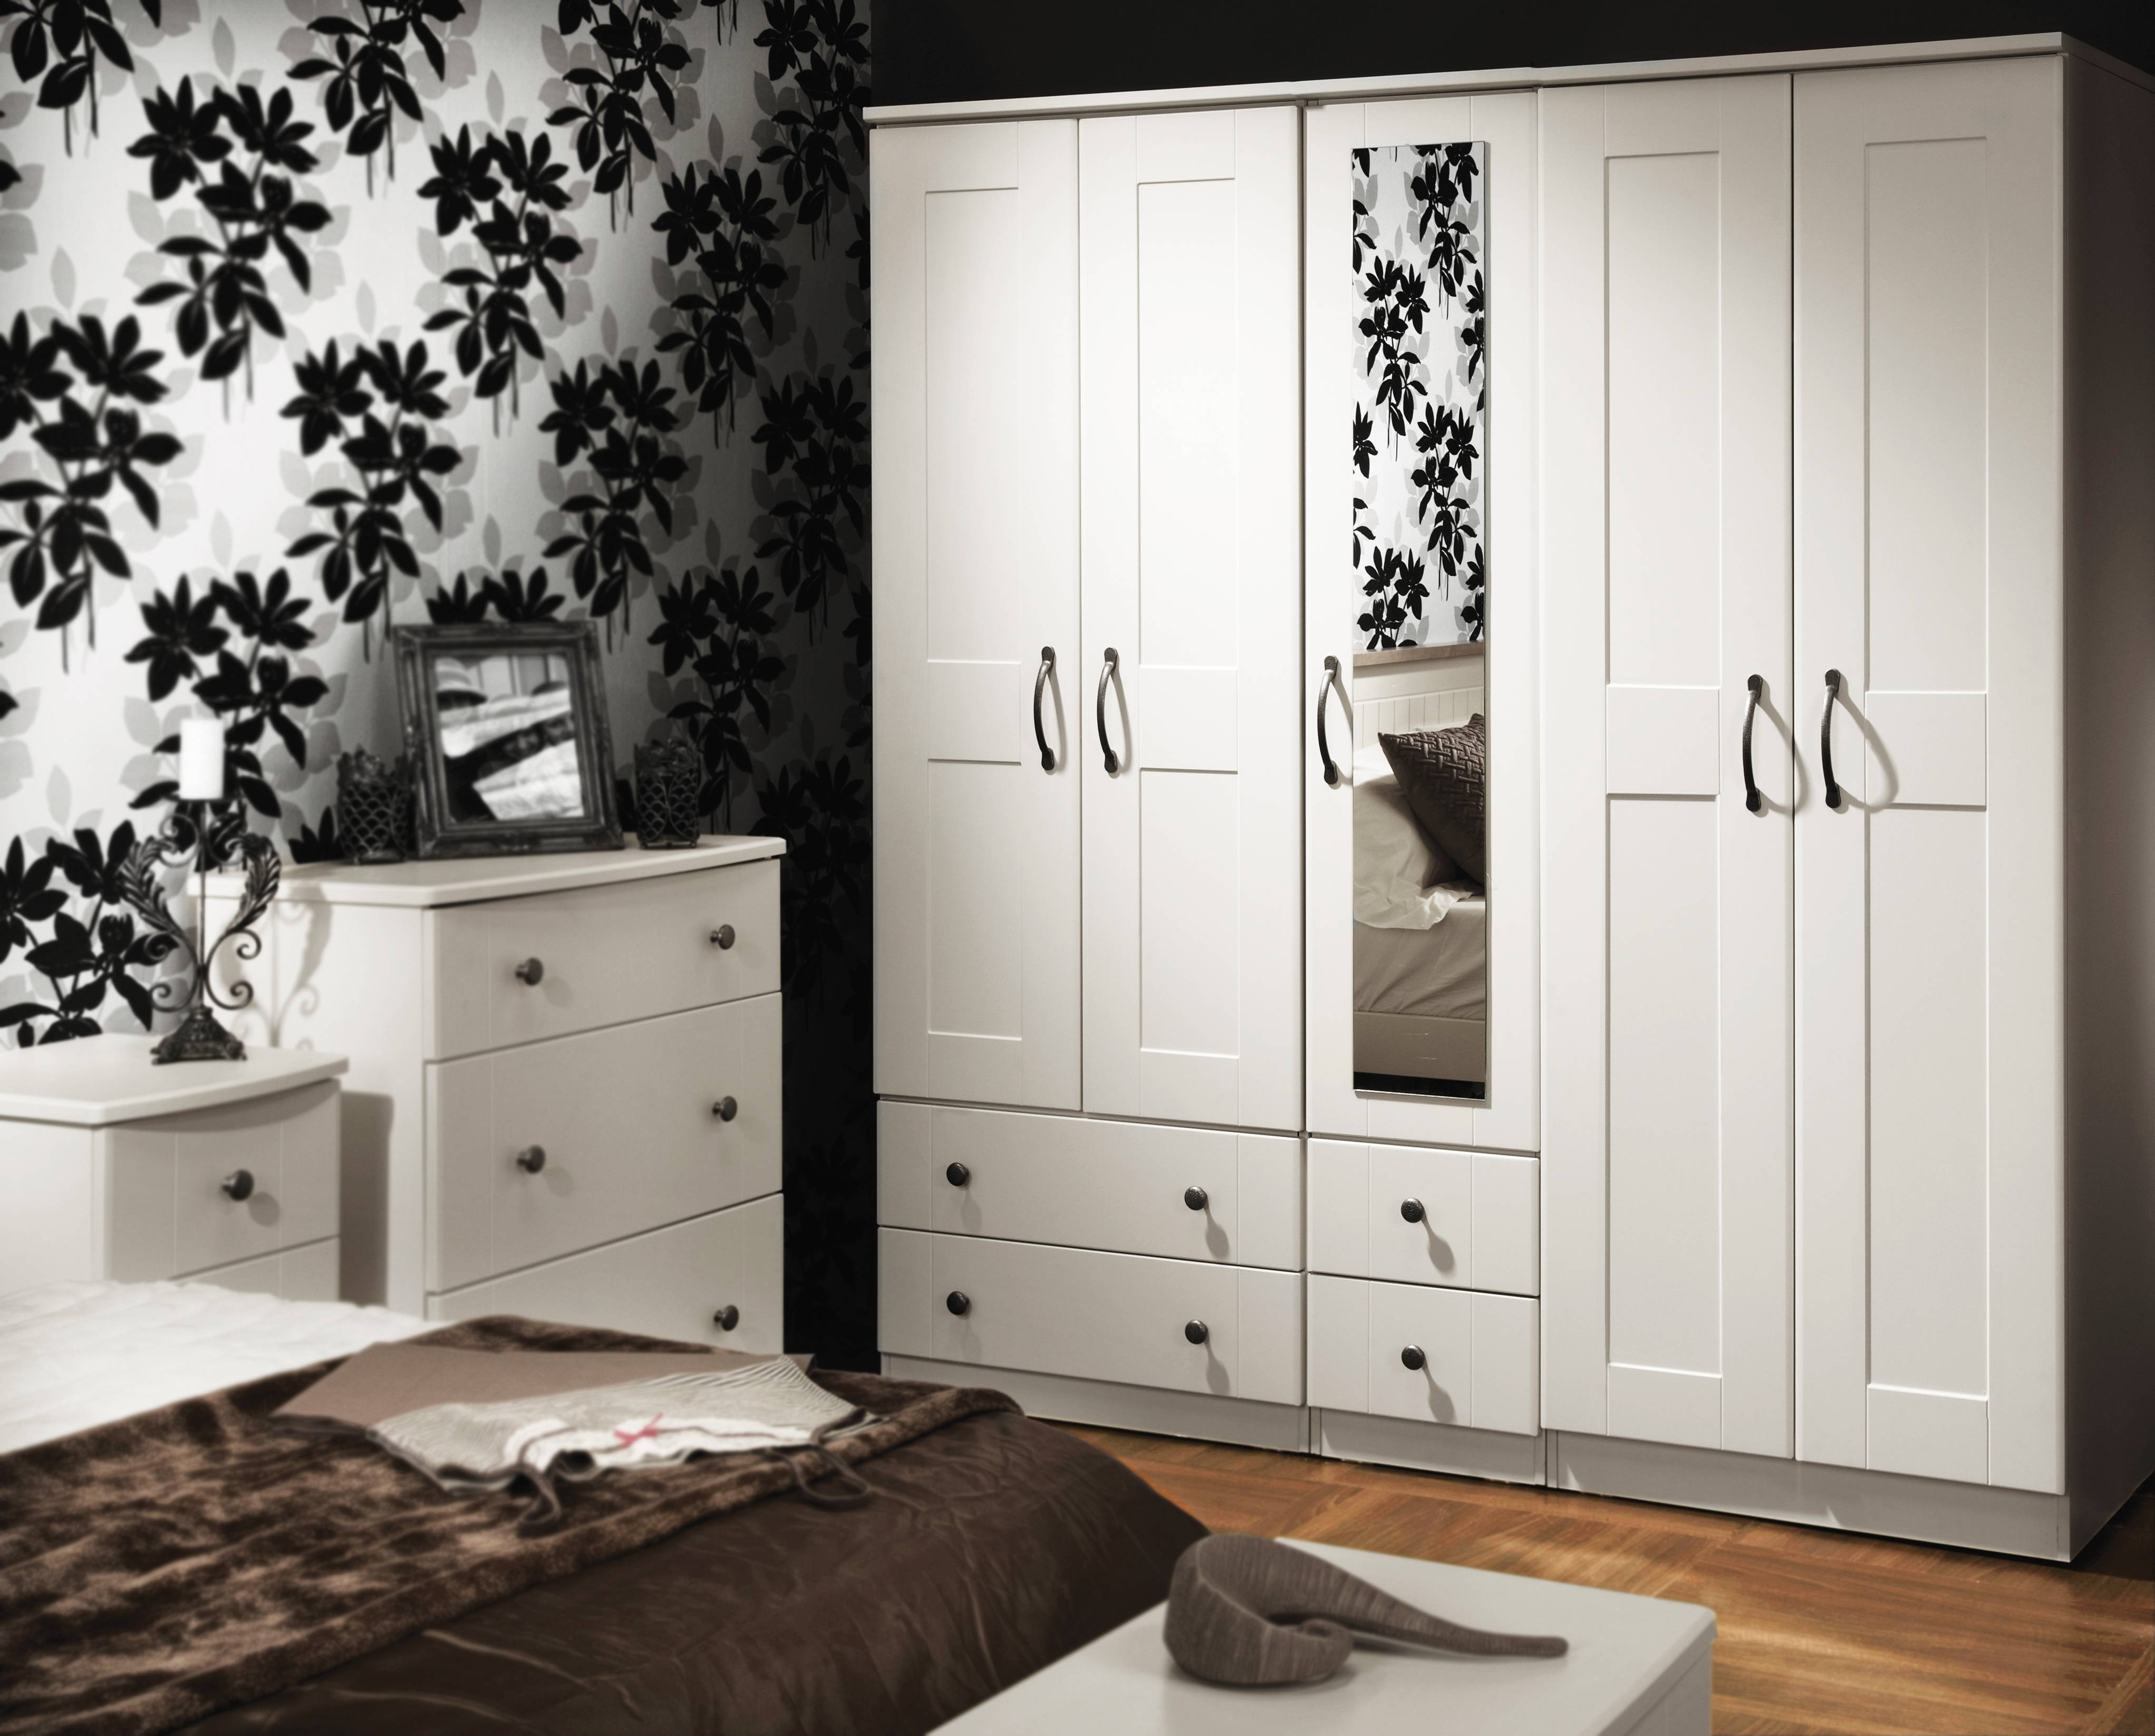 Kingsley Bedroom | Lifestyle Furniture inside Black And White Wardrobes Set (Image 11 of 15)